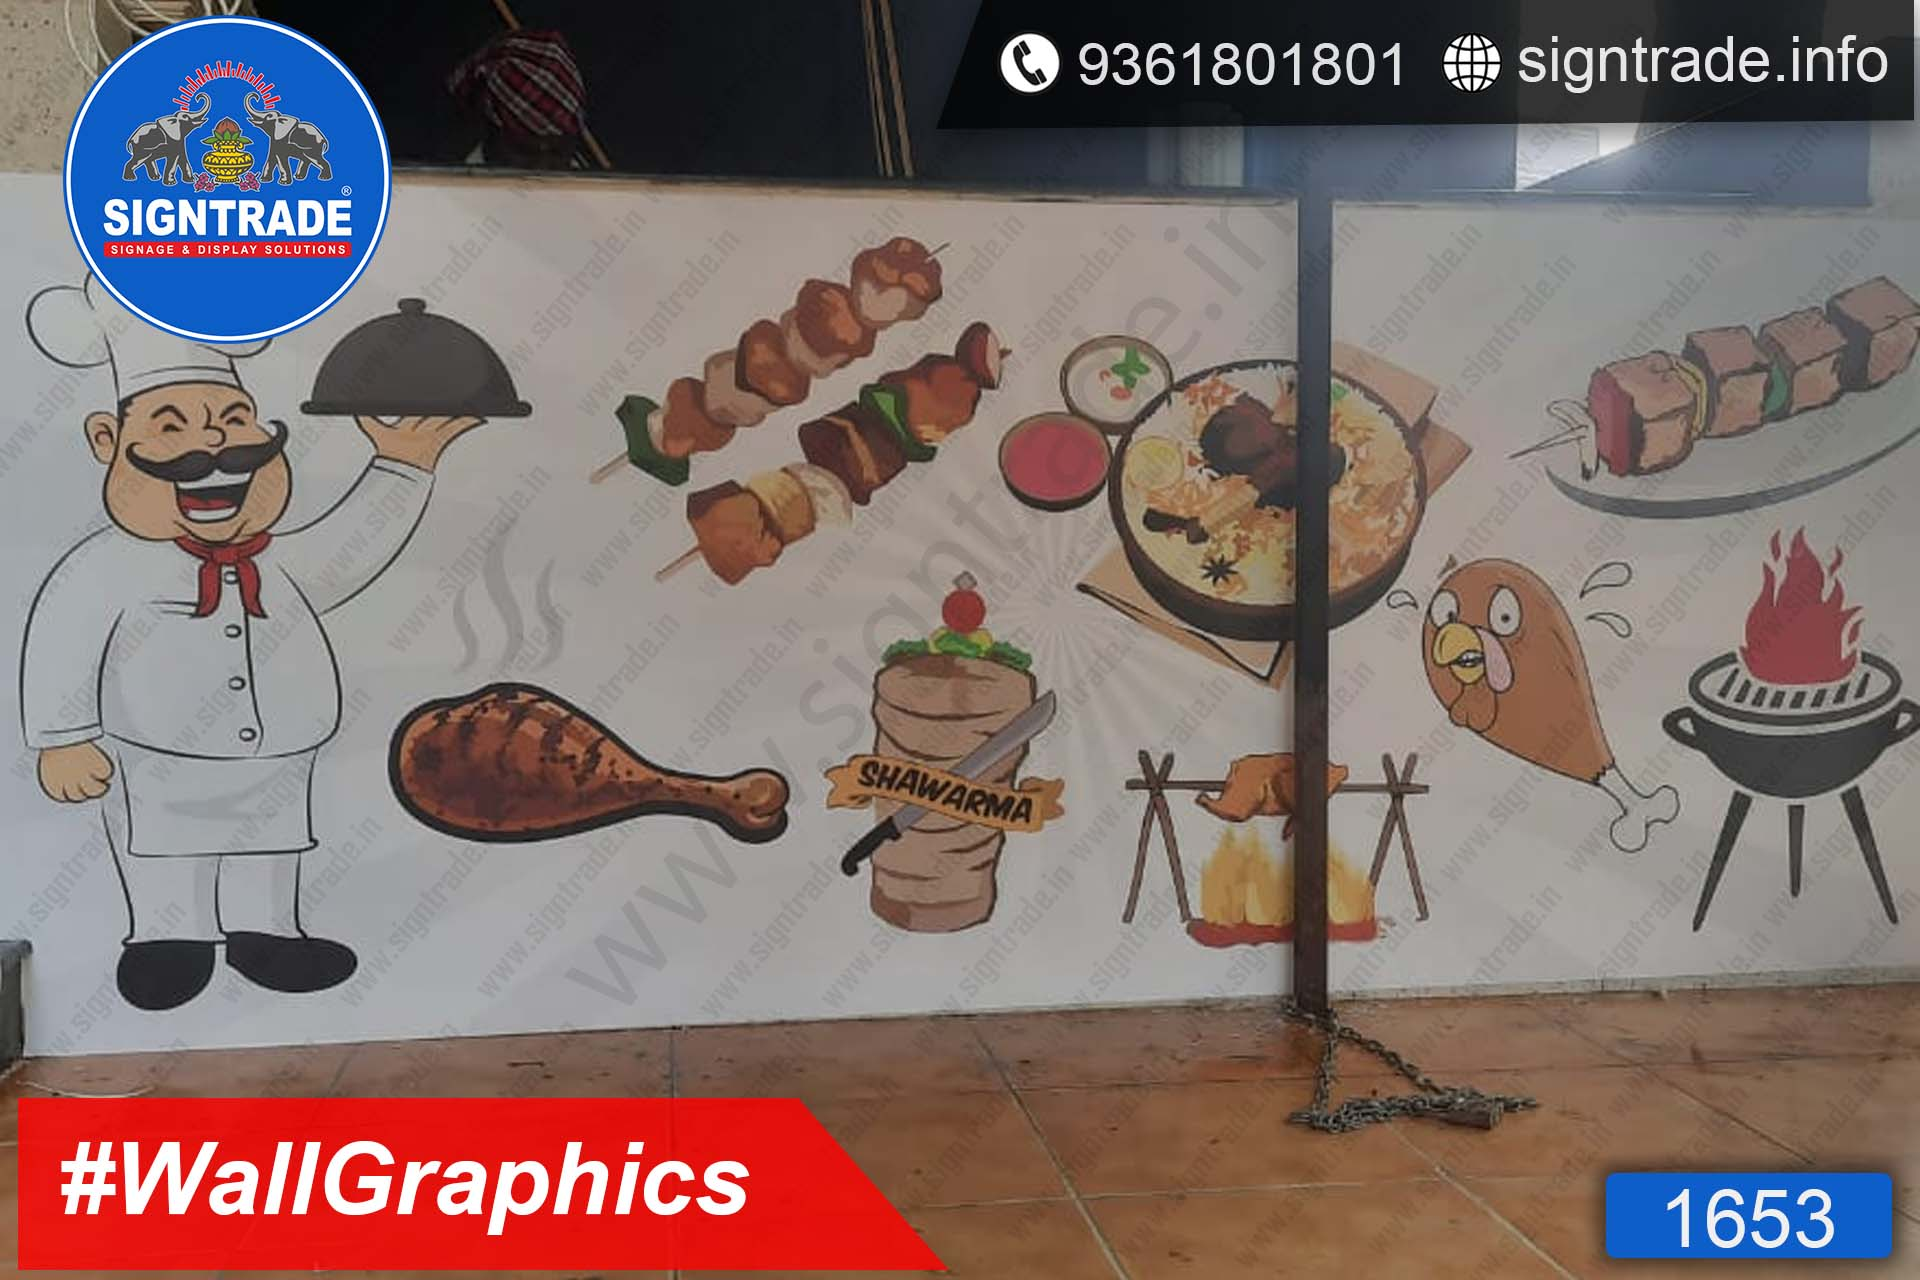 Fresh torrent, Mugappair, Chennai - SIGNTRADE - Wall Graphics, Vinyl Printing, Digital Printing Service in Chennai